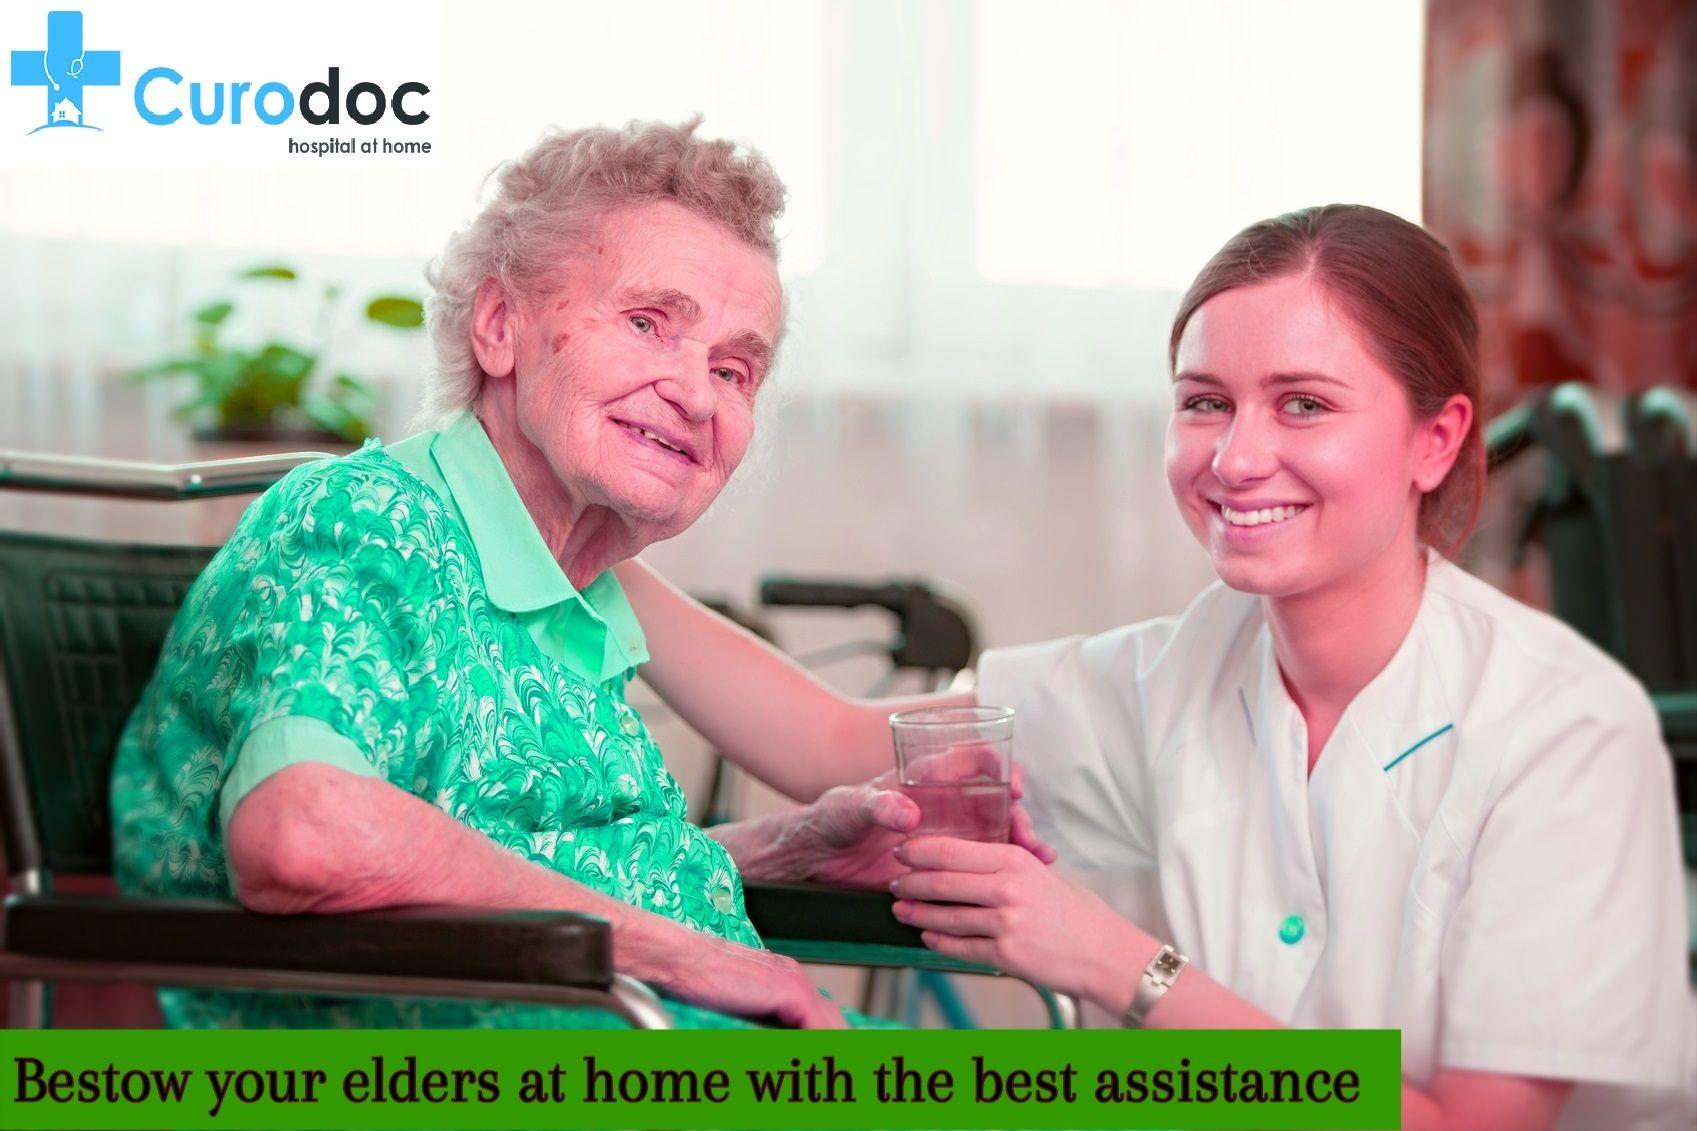 Elderly Care In 2020 Elderly Care Elderly Cancer Care